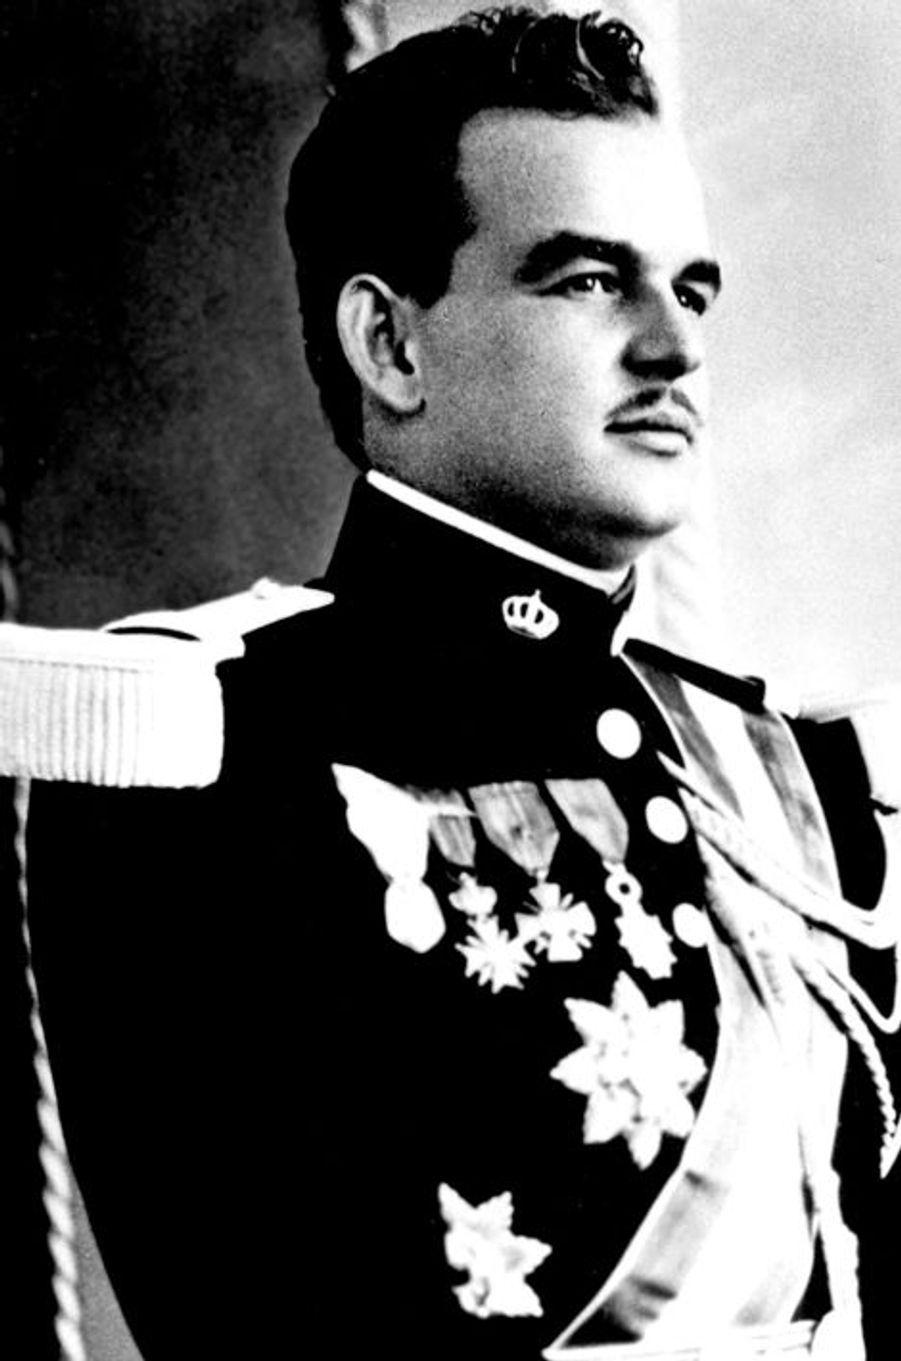 Le prince Rainier III de Monaco, le 1er octobre 1949